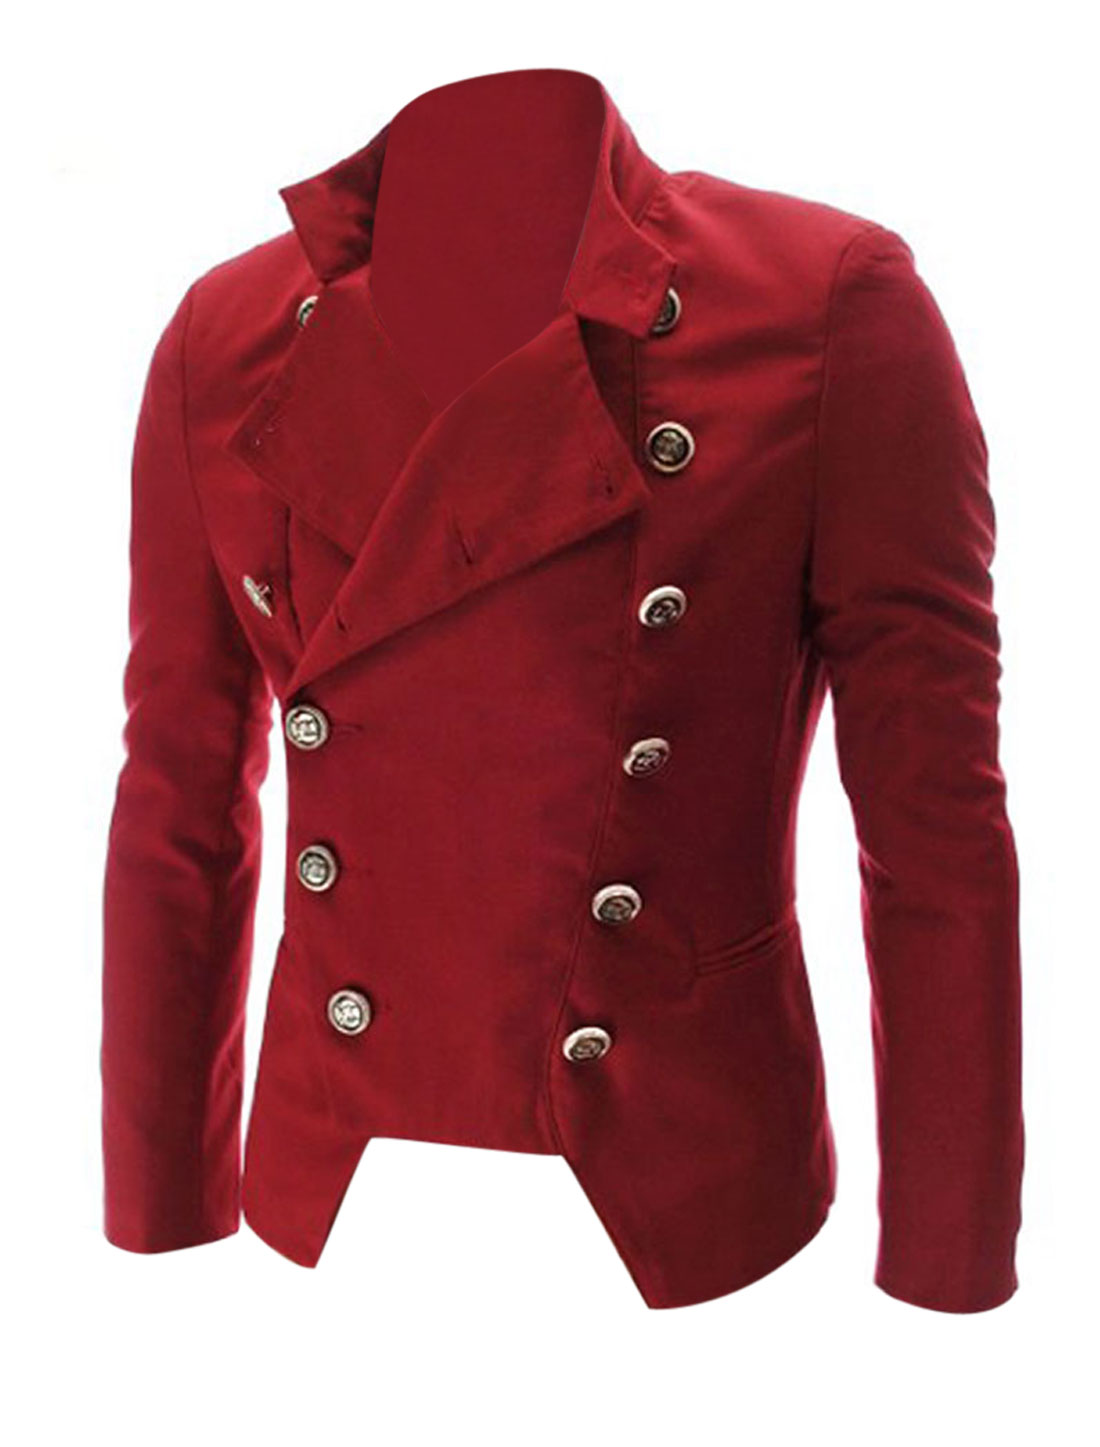 Men Casual Slim Fit Pocket Irregular Double Breasted Suit Jacket Blazer Red M